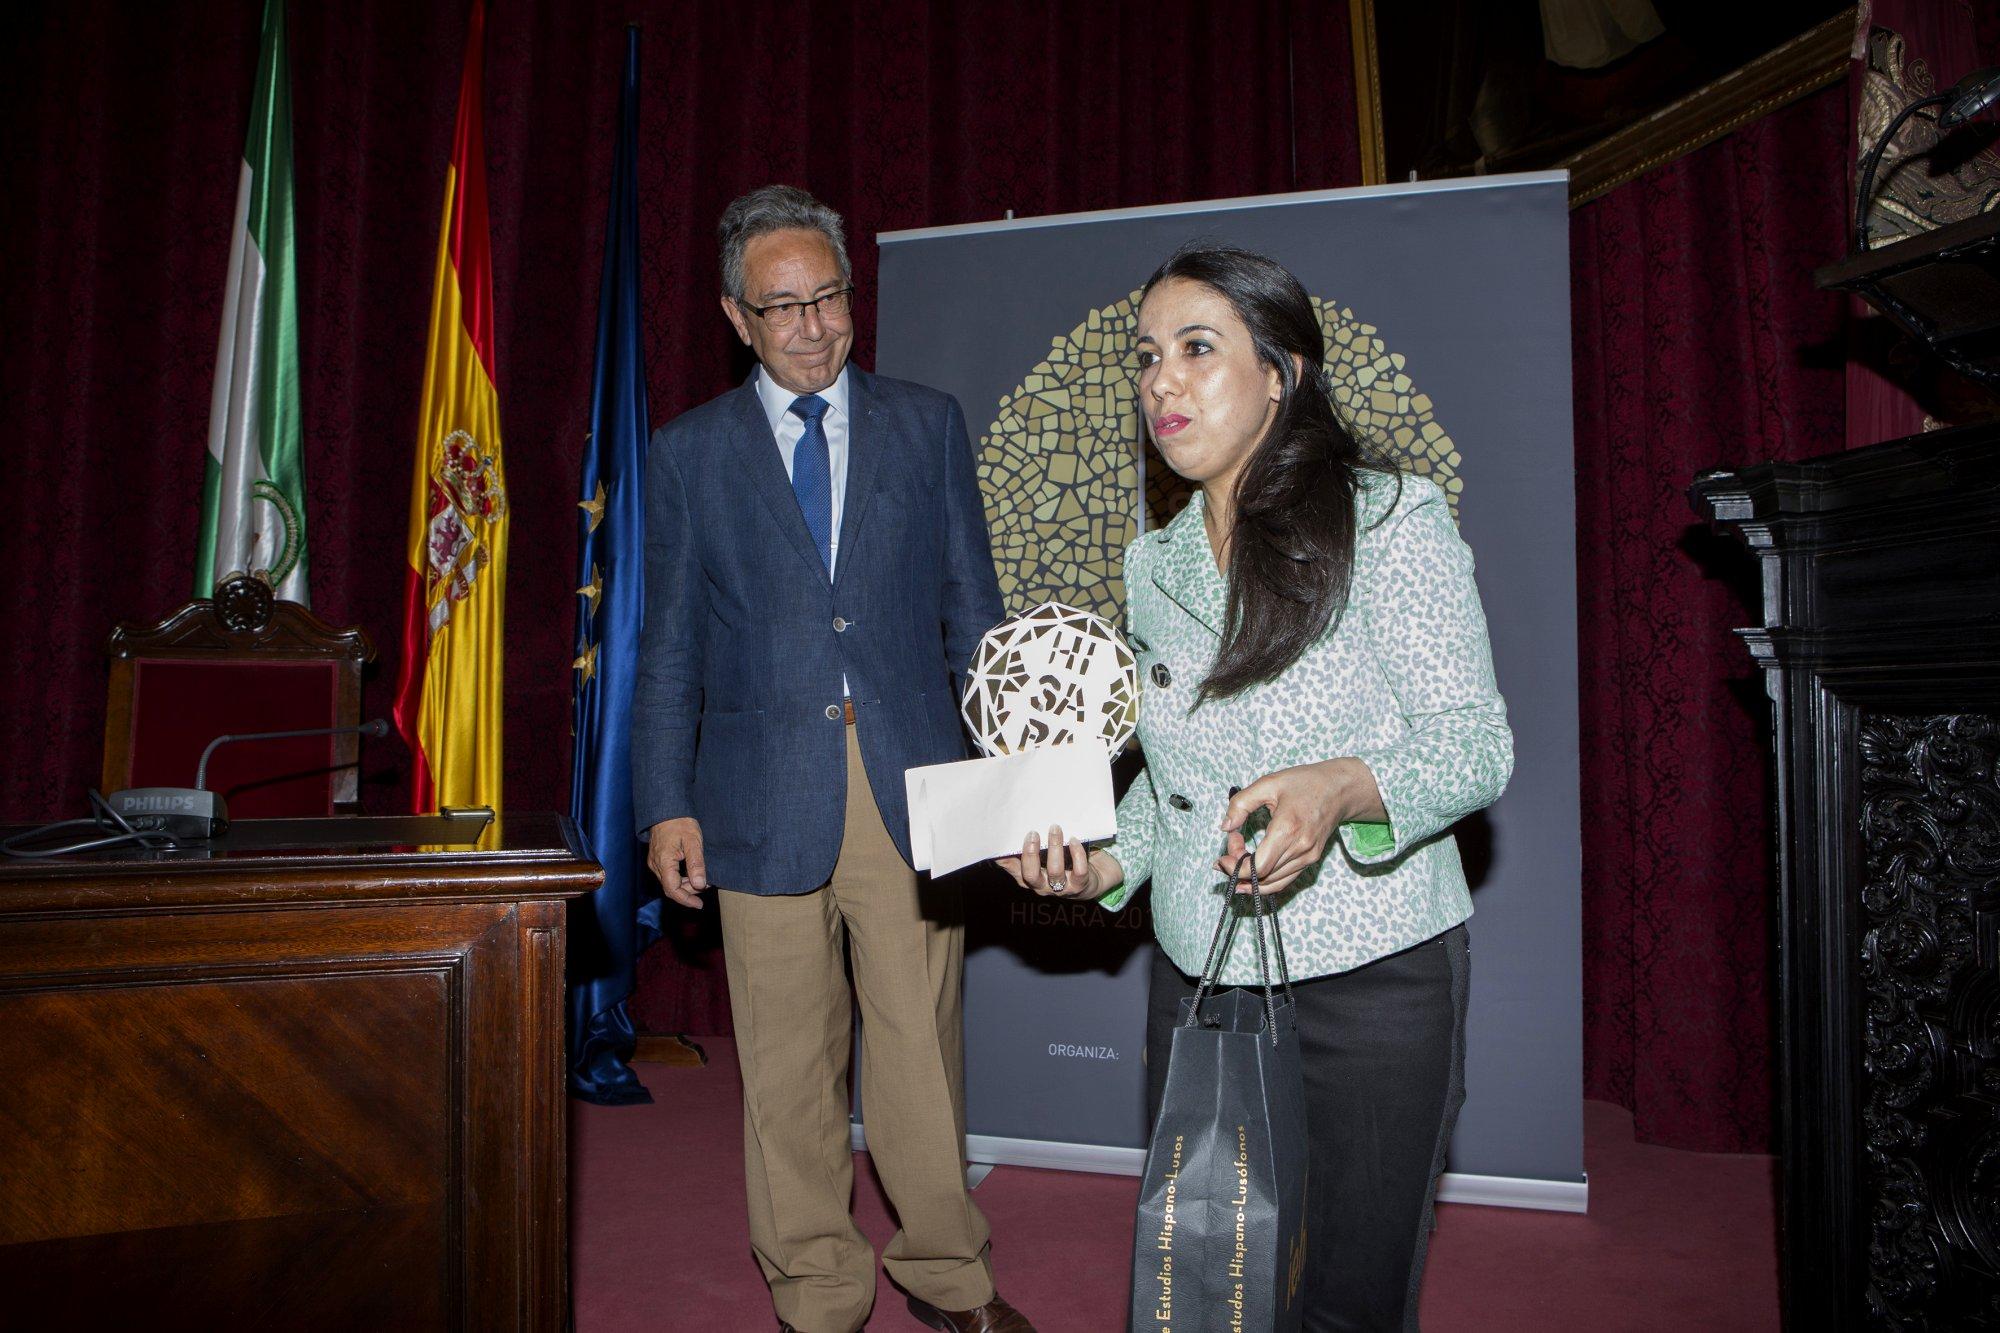 Ms. Rajae El Khamsi from Instituto de Estudios Hispano-Lusos in University Mohammed V and Mr. José Manuel Cervera, Director of Fundación Tres Culturas